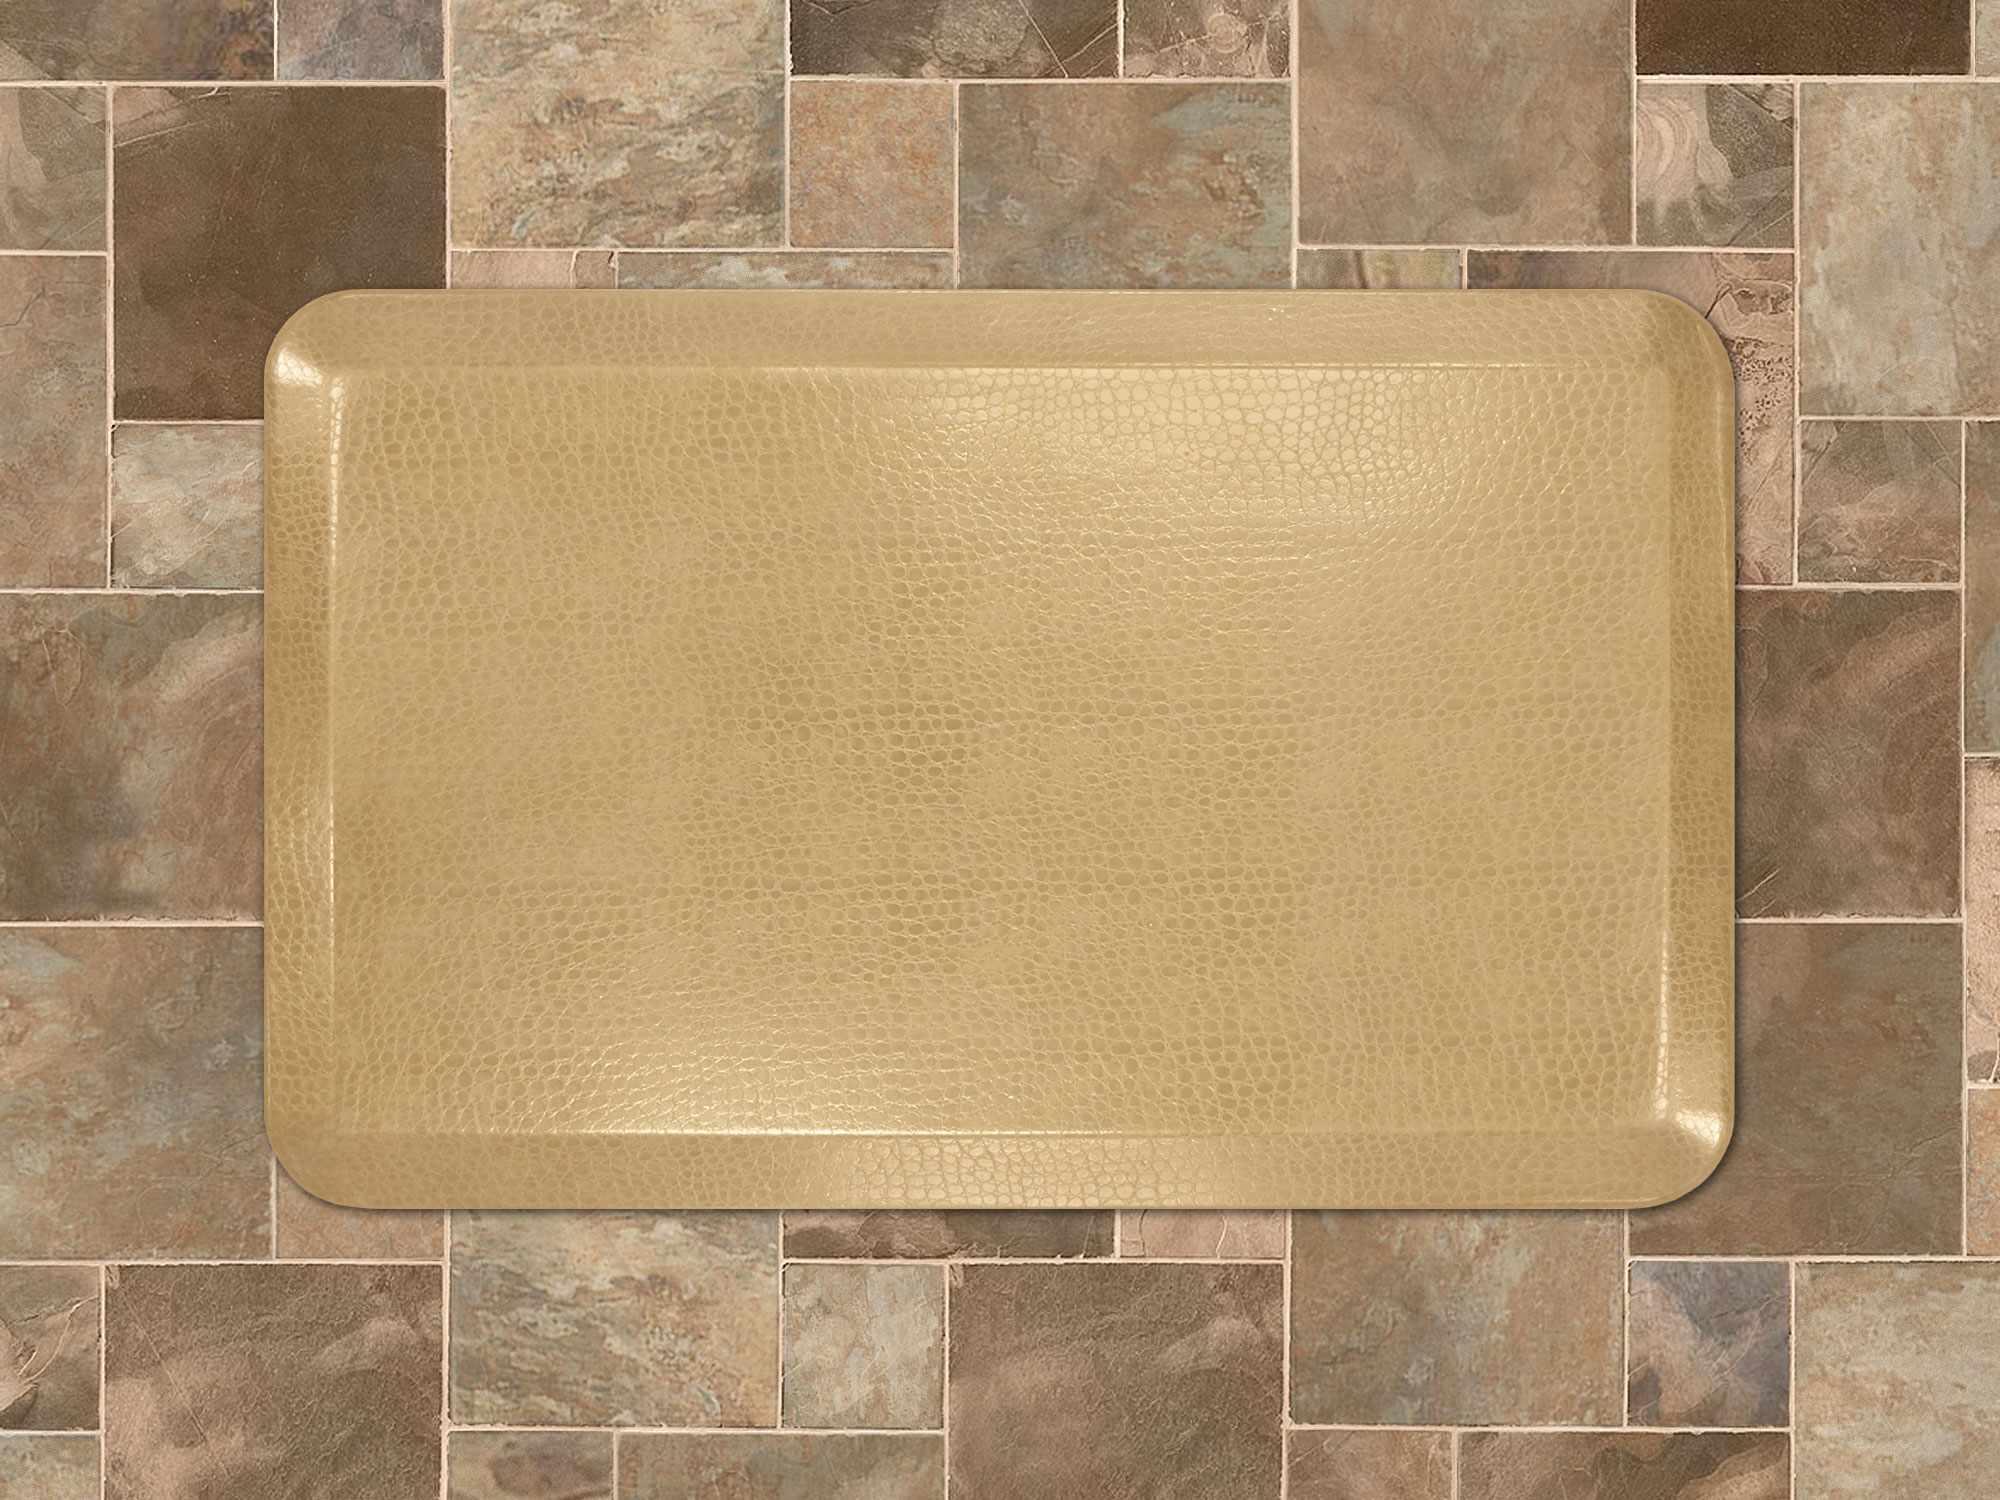 Kitchen Gel Mats Decorative Anti Fatigue Floor Mats